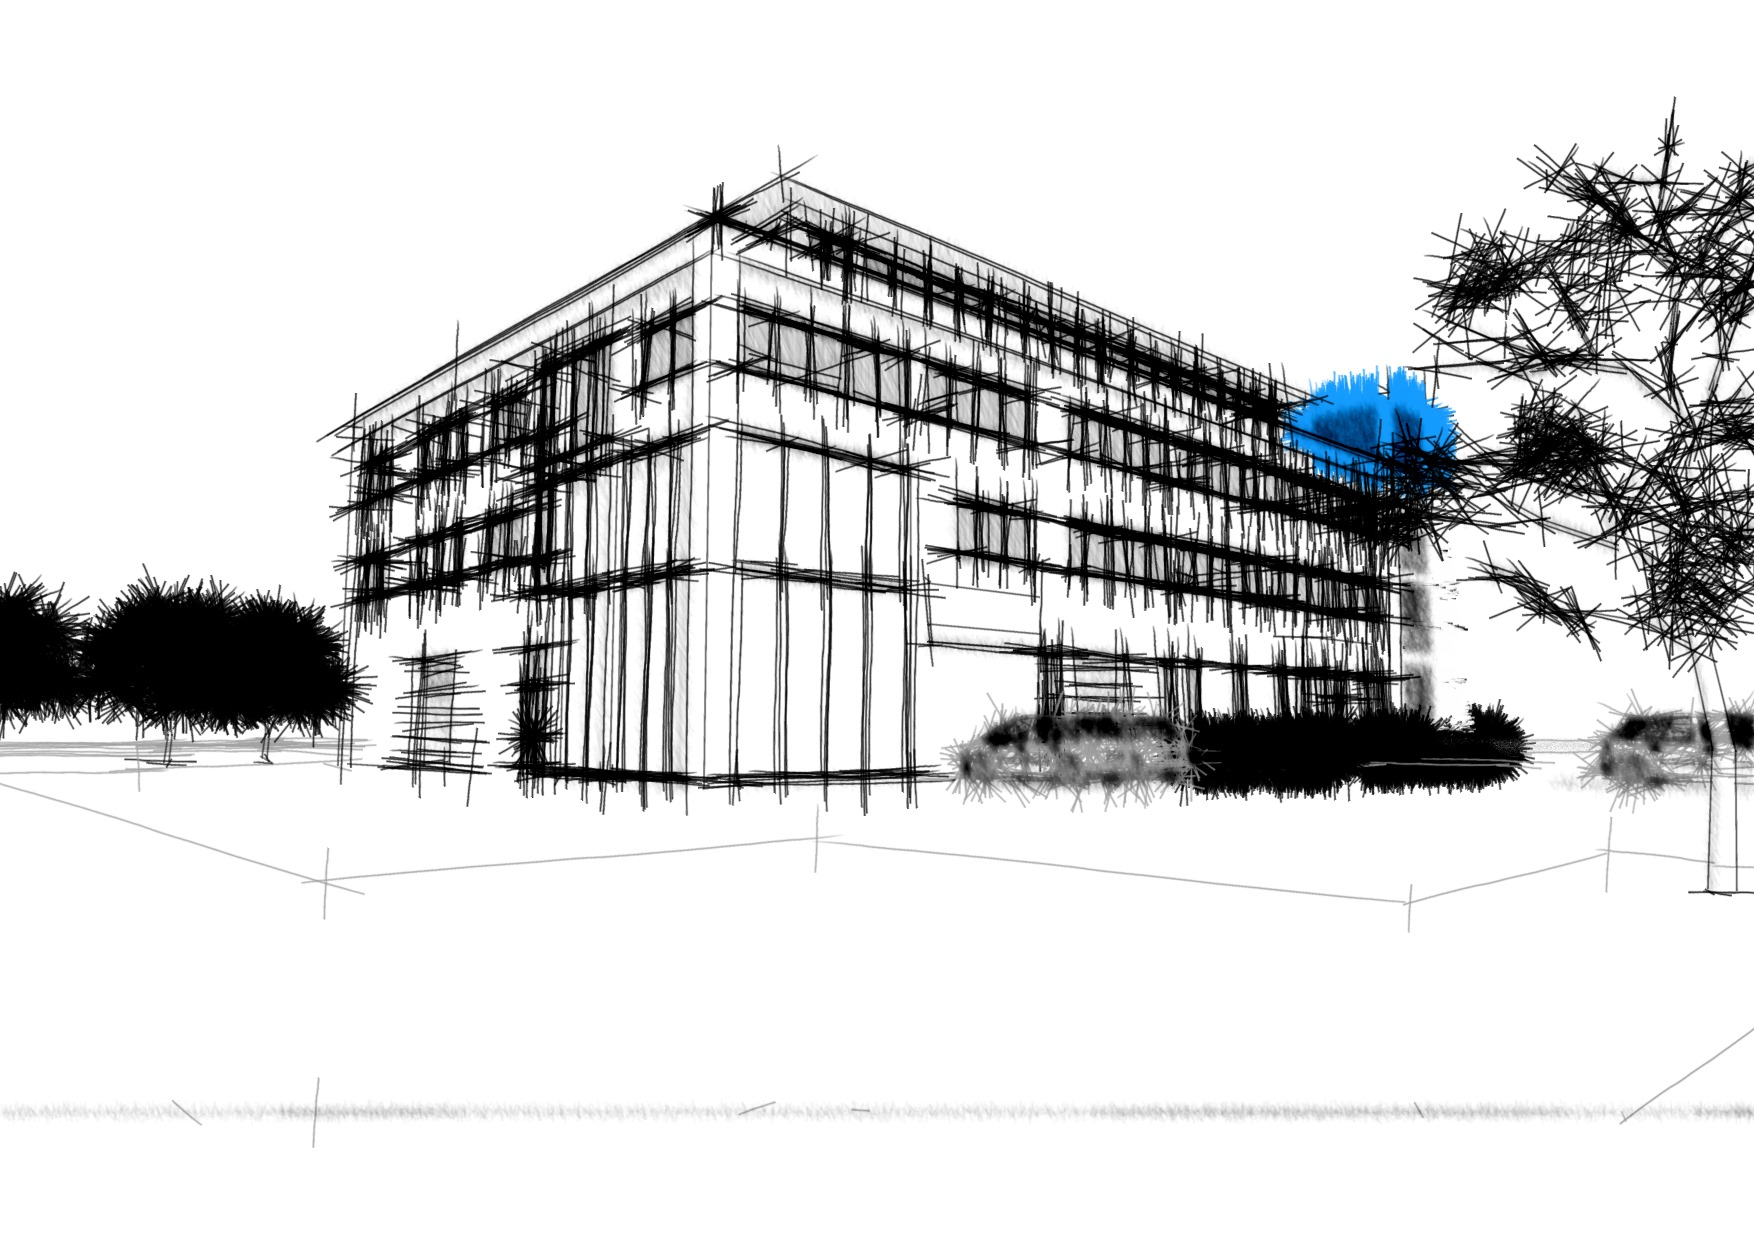 Skizze pro-mciron Firmengebäude